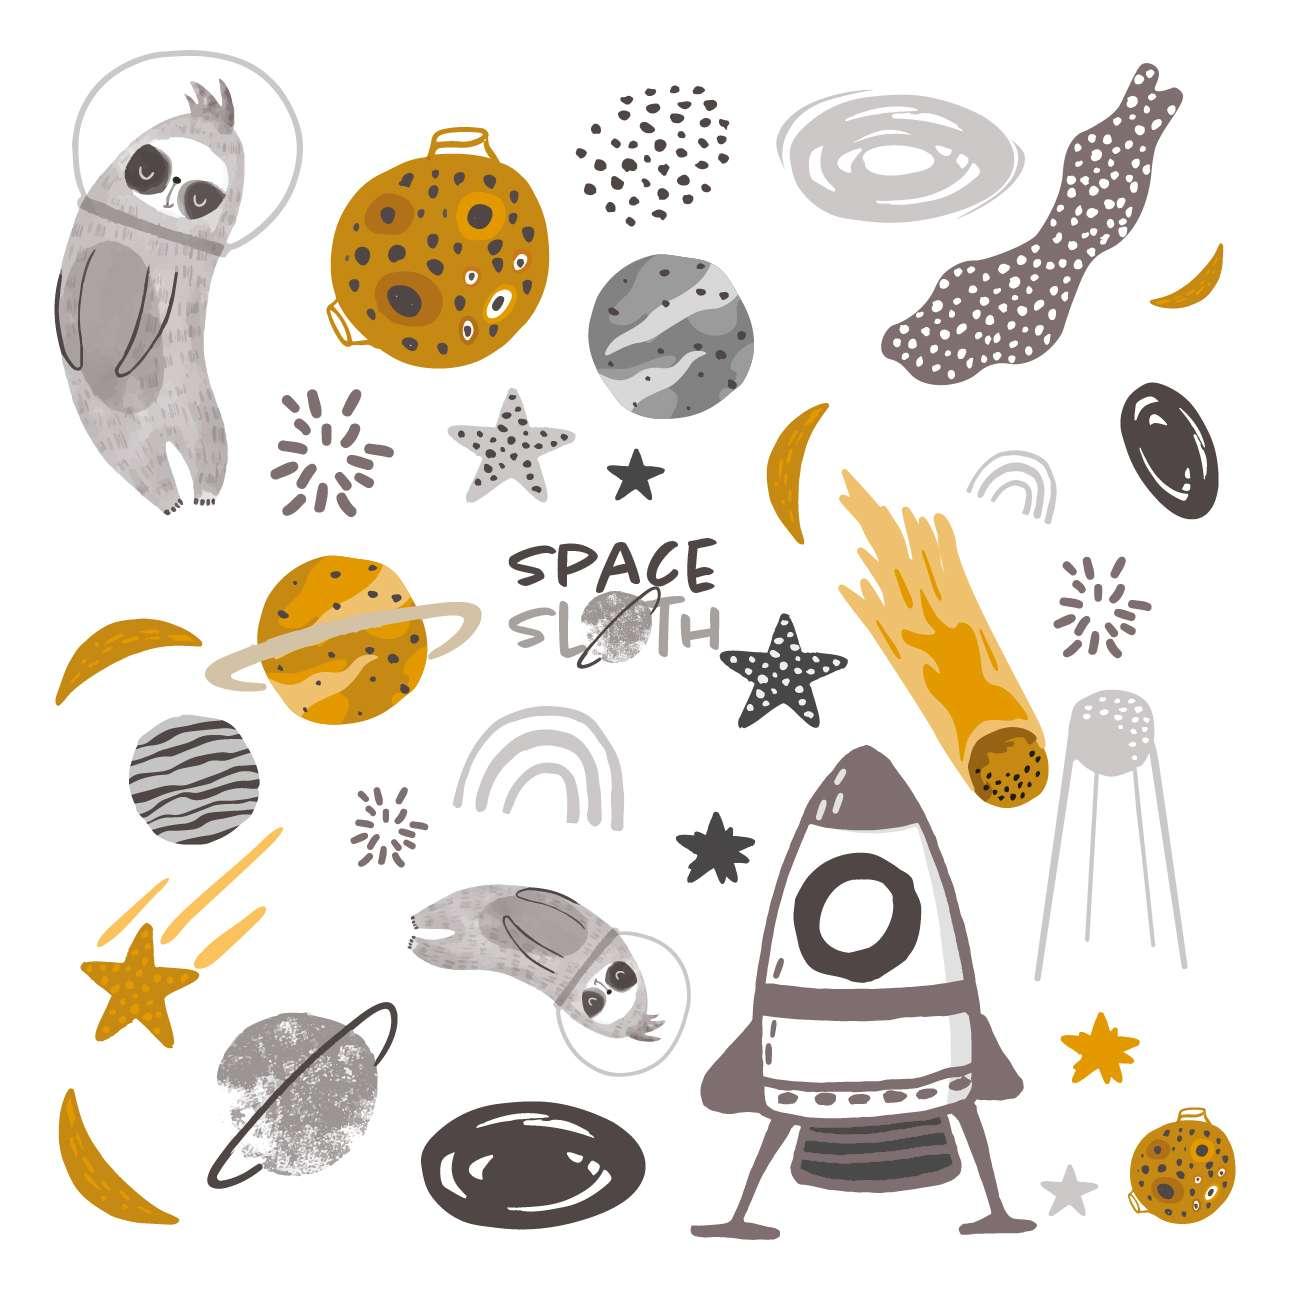 Space Sloth sticker set